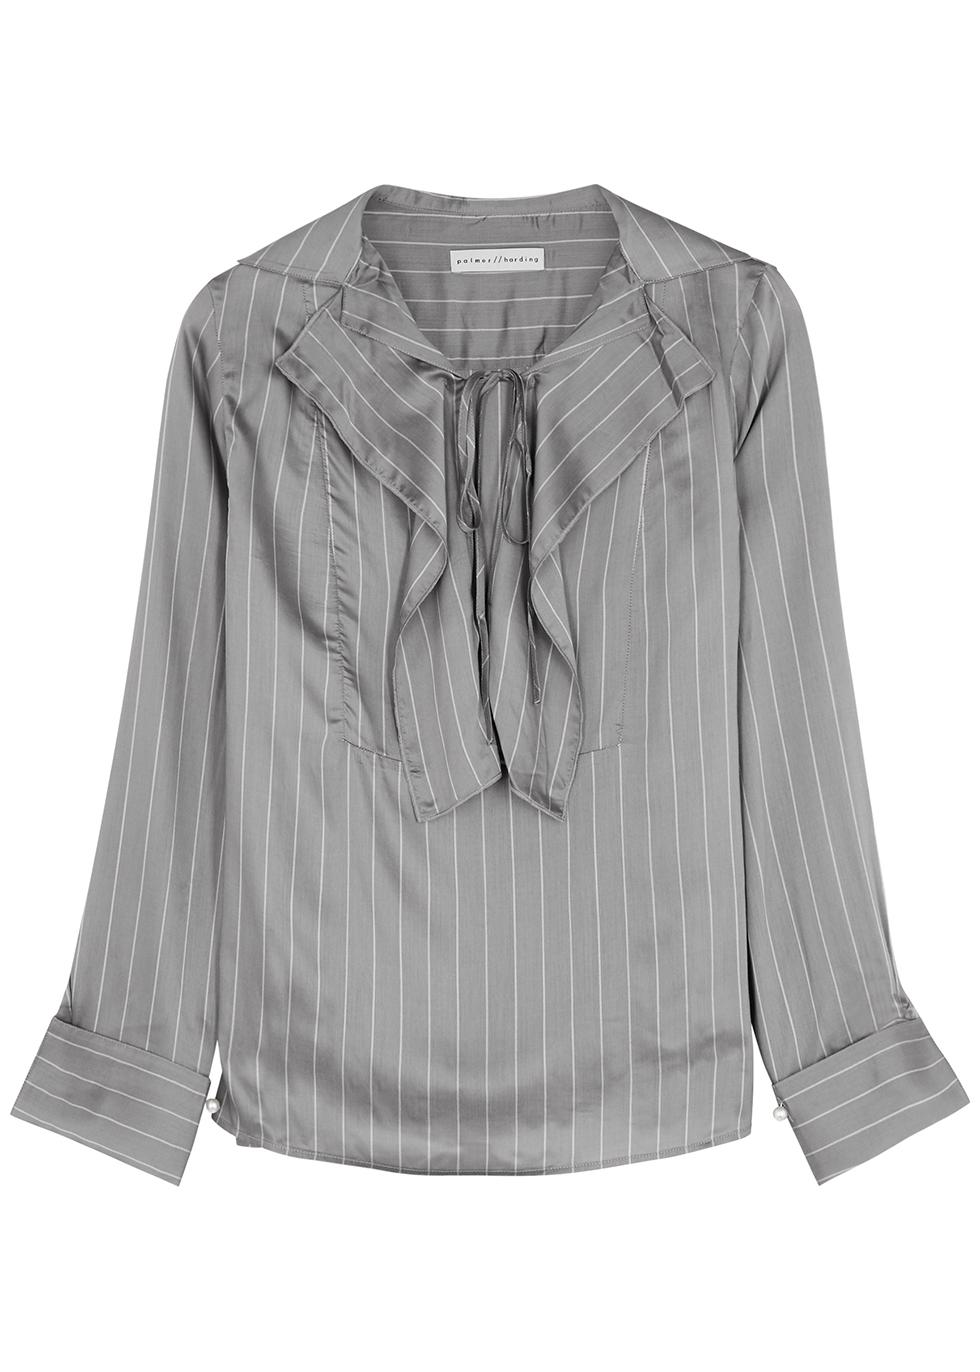 Emotions Unfold grey striped blouse